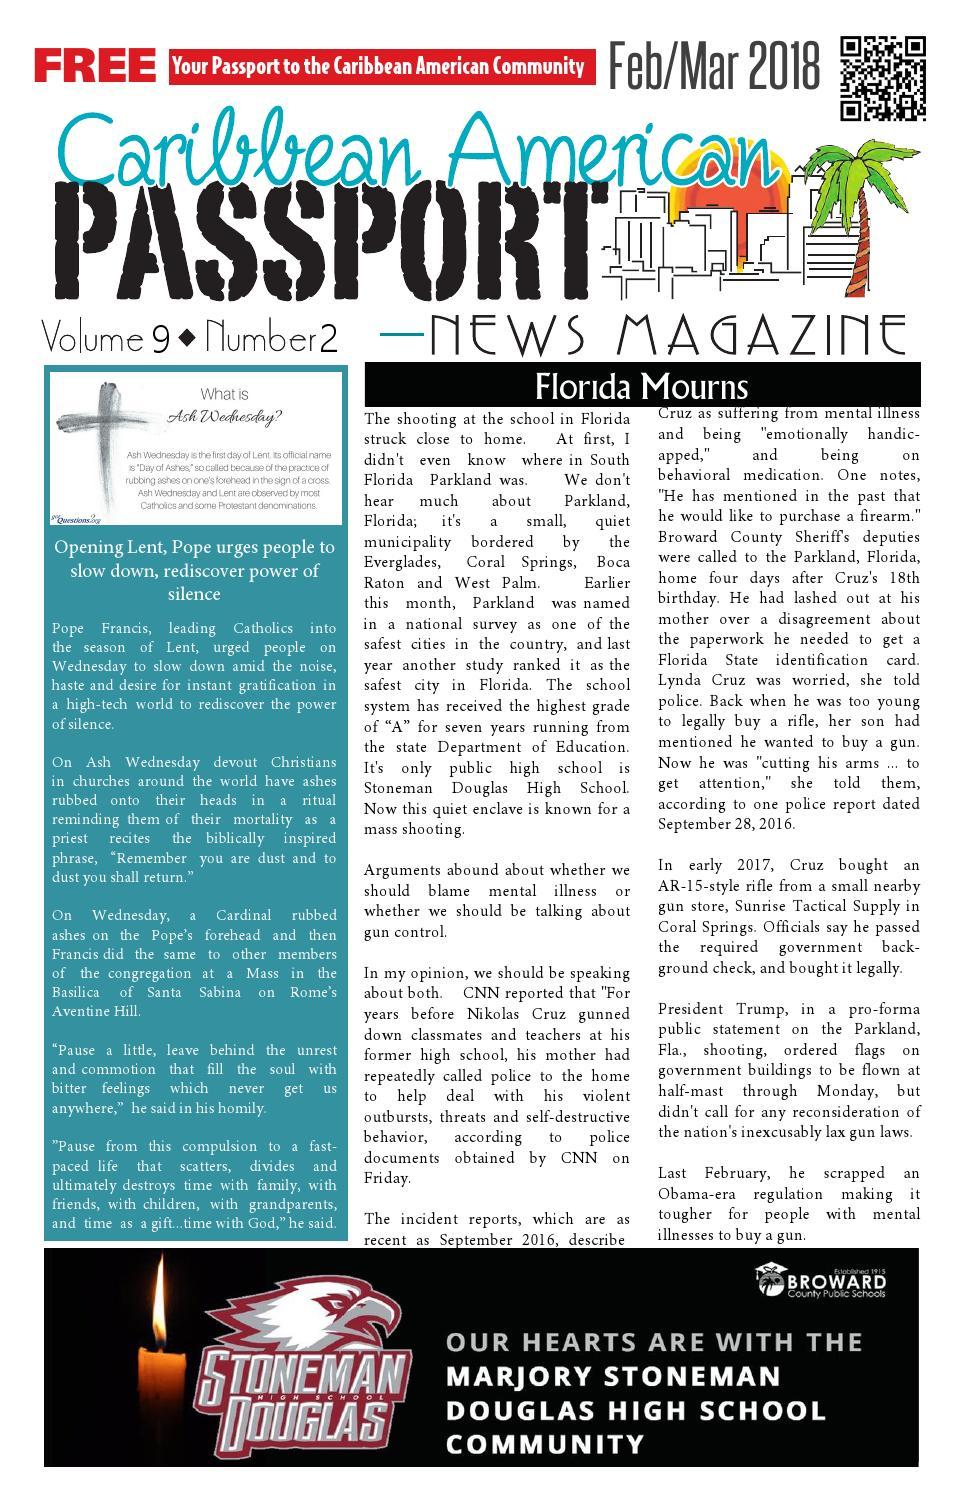 Caribbean American Passport News Magazine - February 2018 by ...